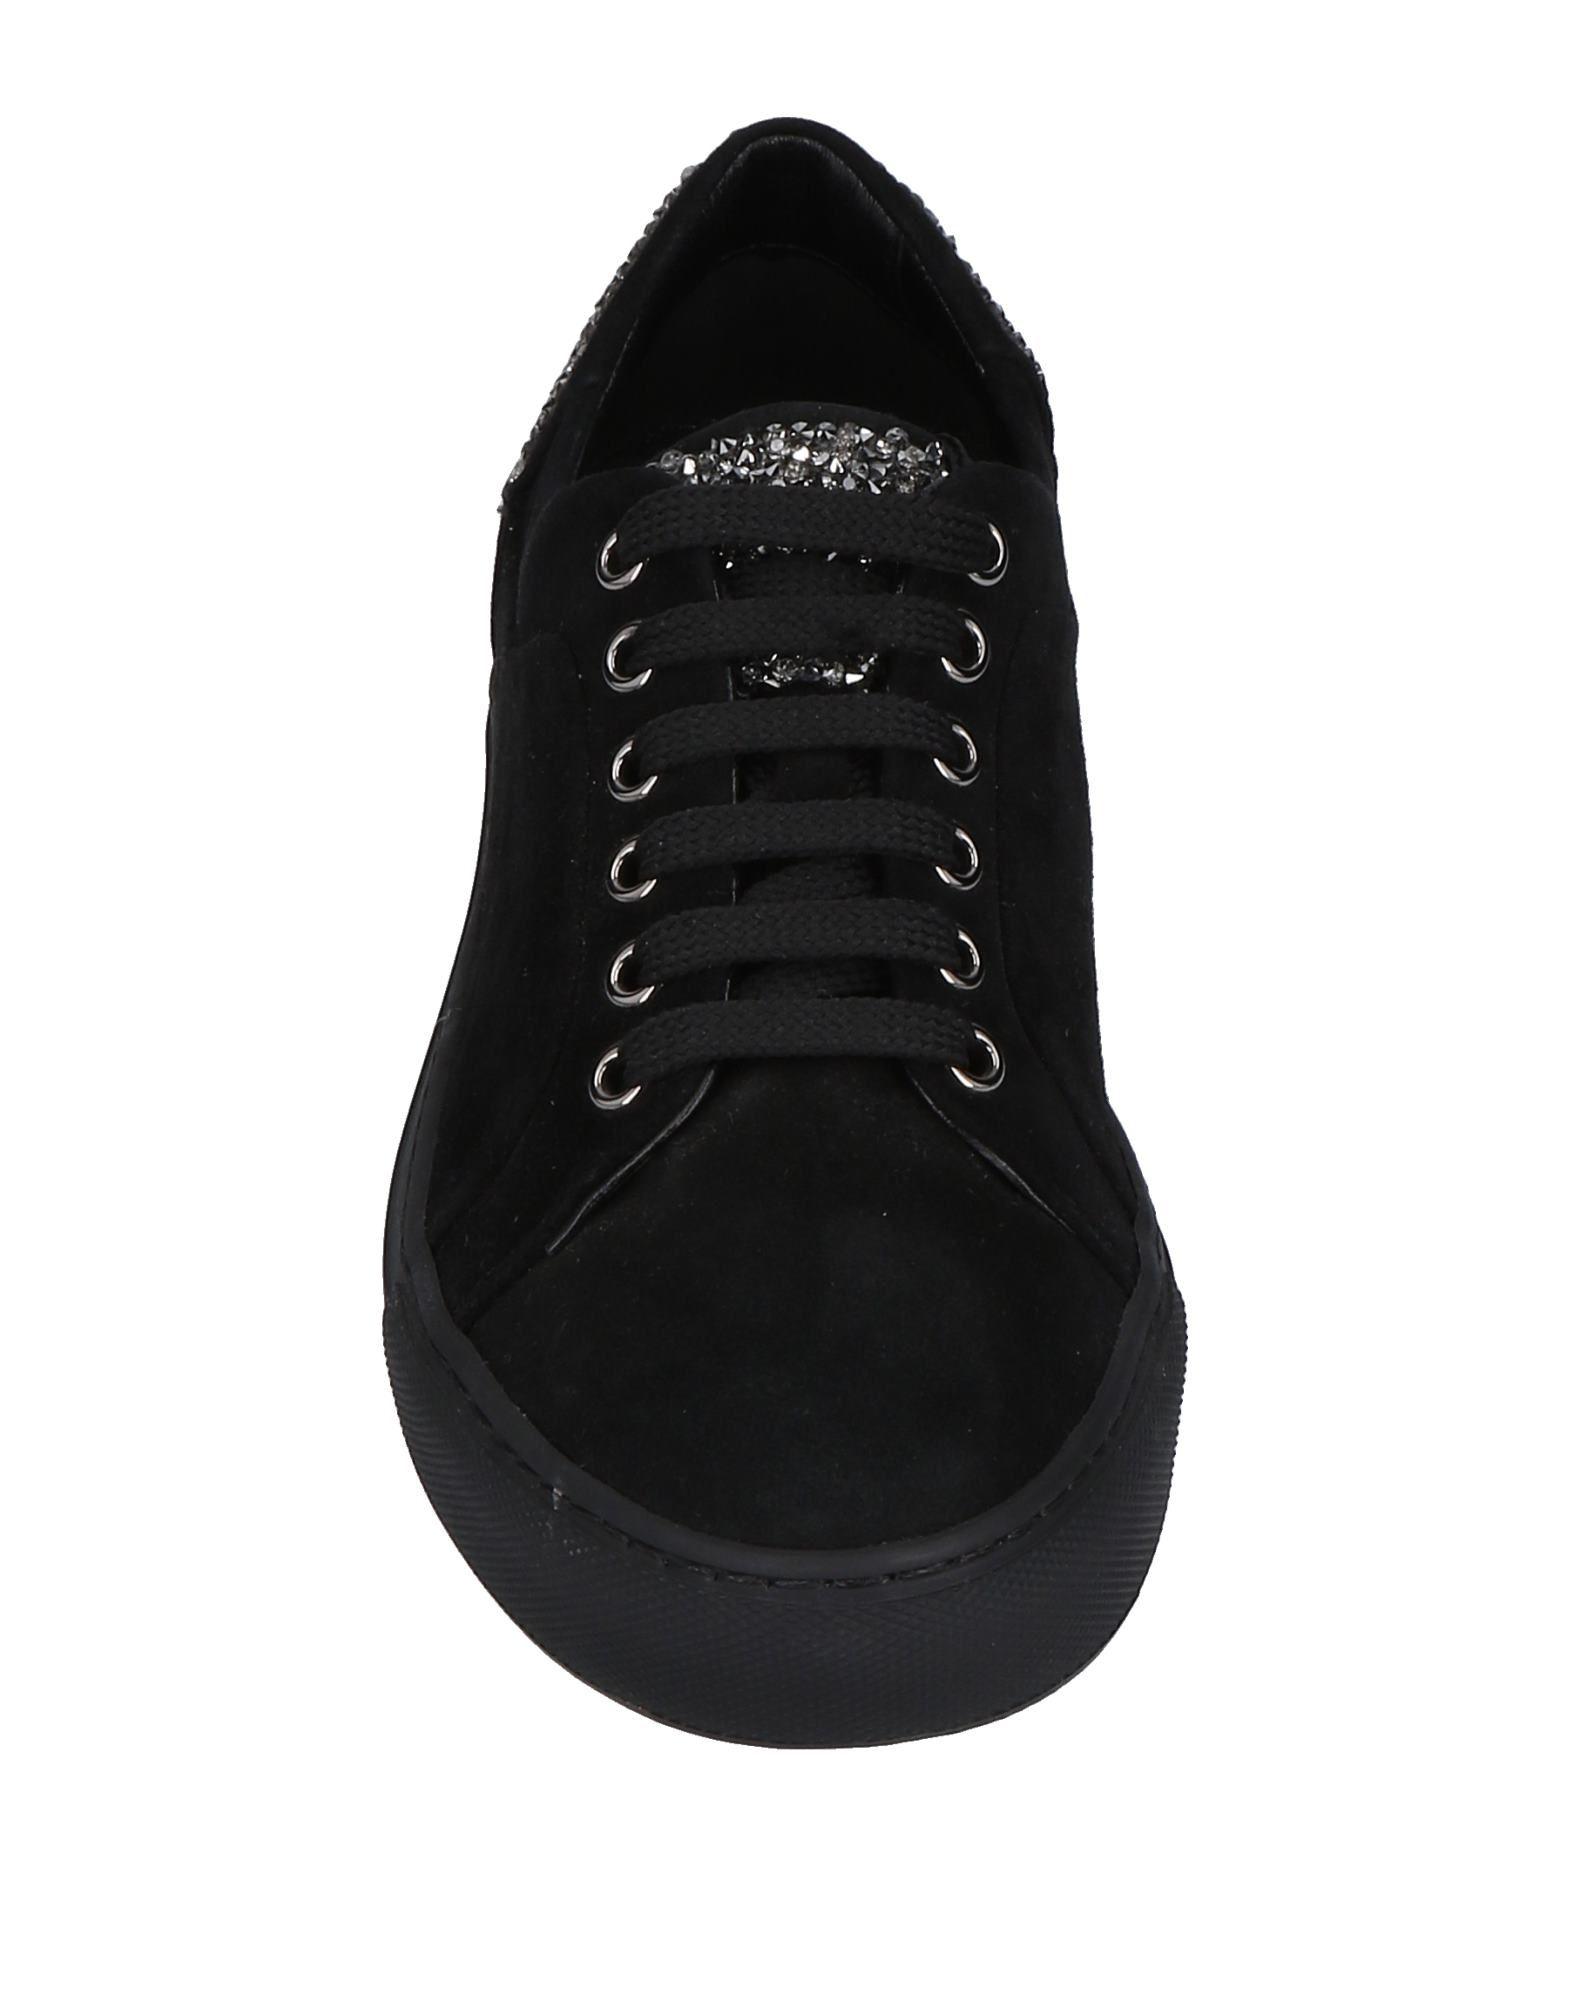 Moda Sneakers Maimai Donna - 11501952DI 11501952DI 11501952DI 0e1617